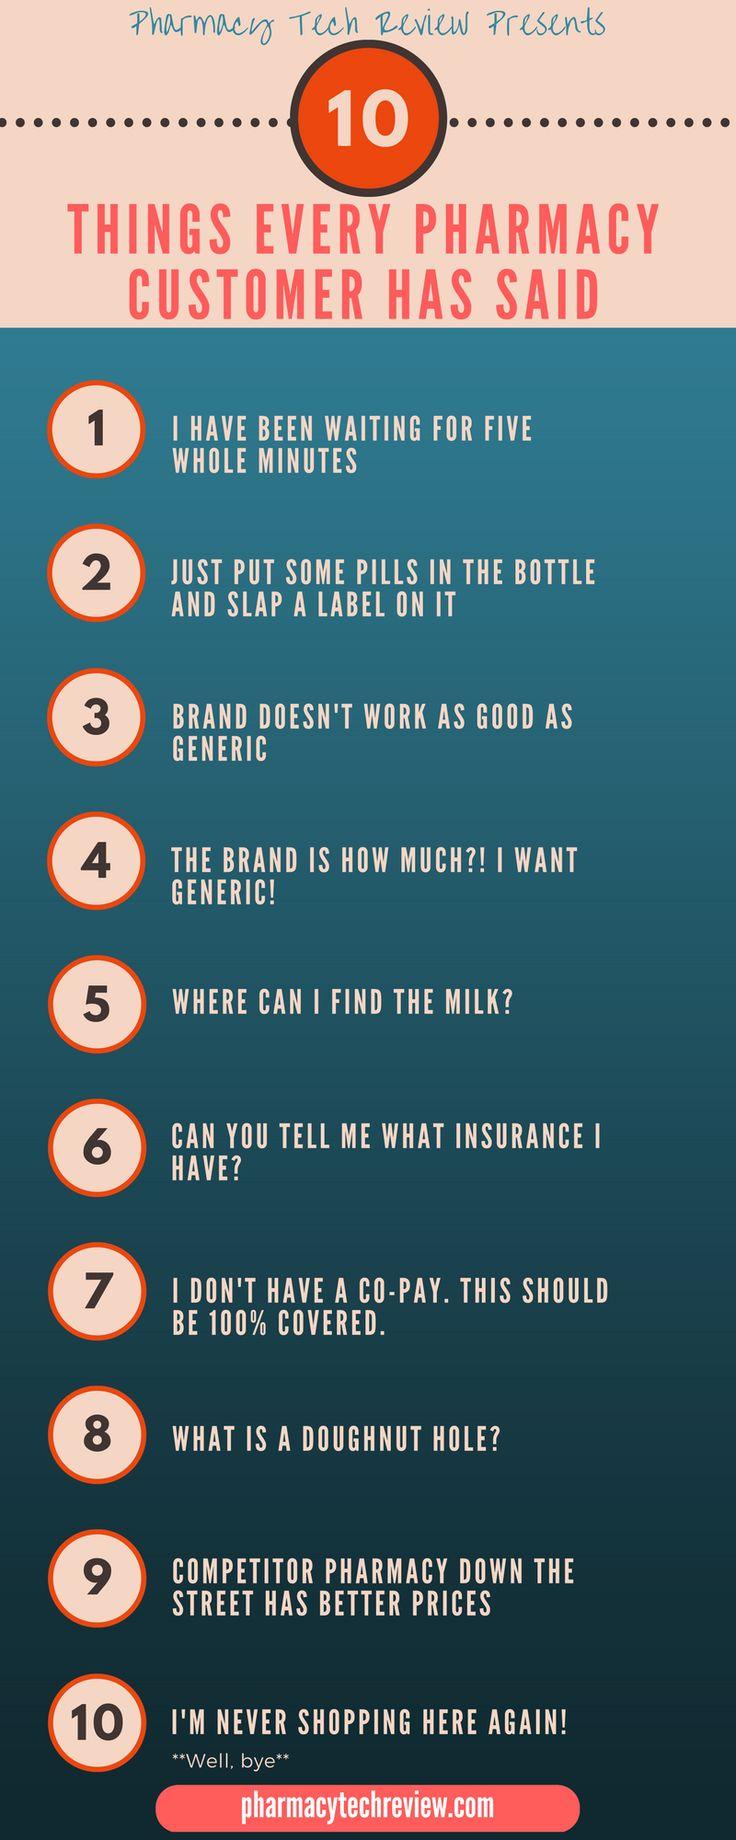 Ten Things Every Pharmacy Customer Has Said